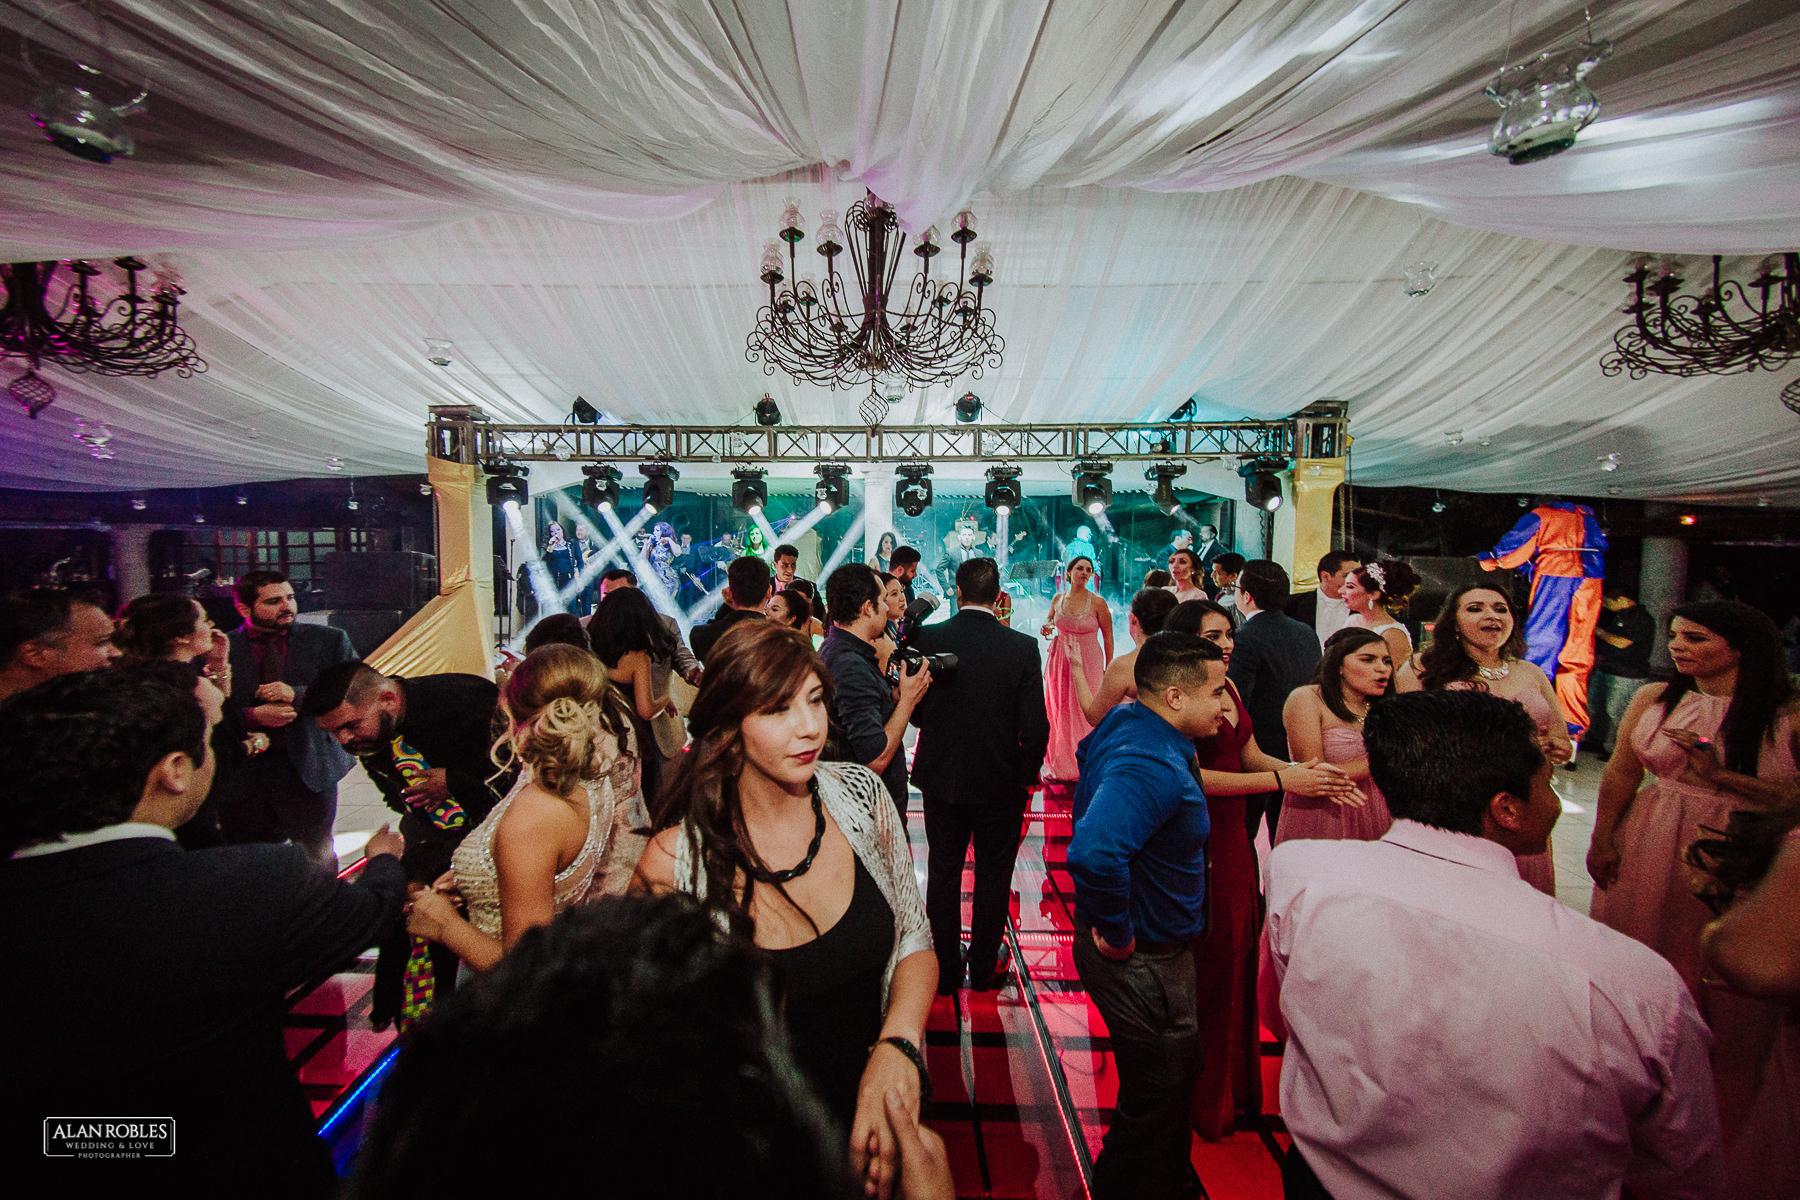 Alan Robles fotografo de bodas guadalajara - LyP Hotel Demetria-67